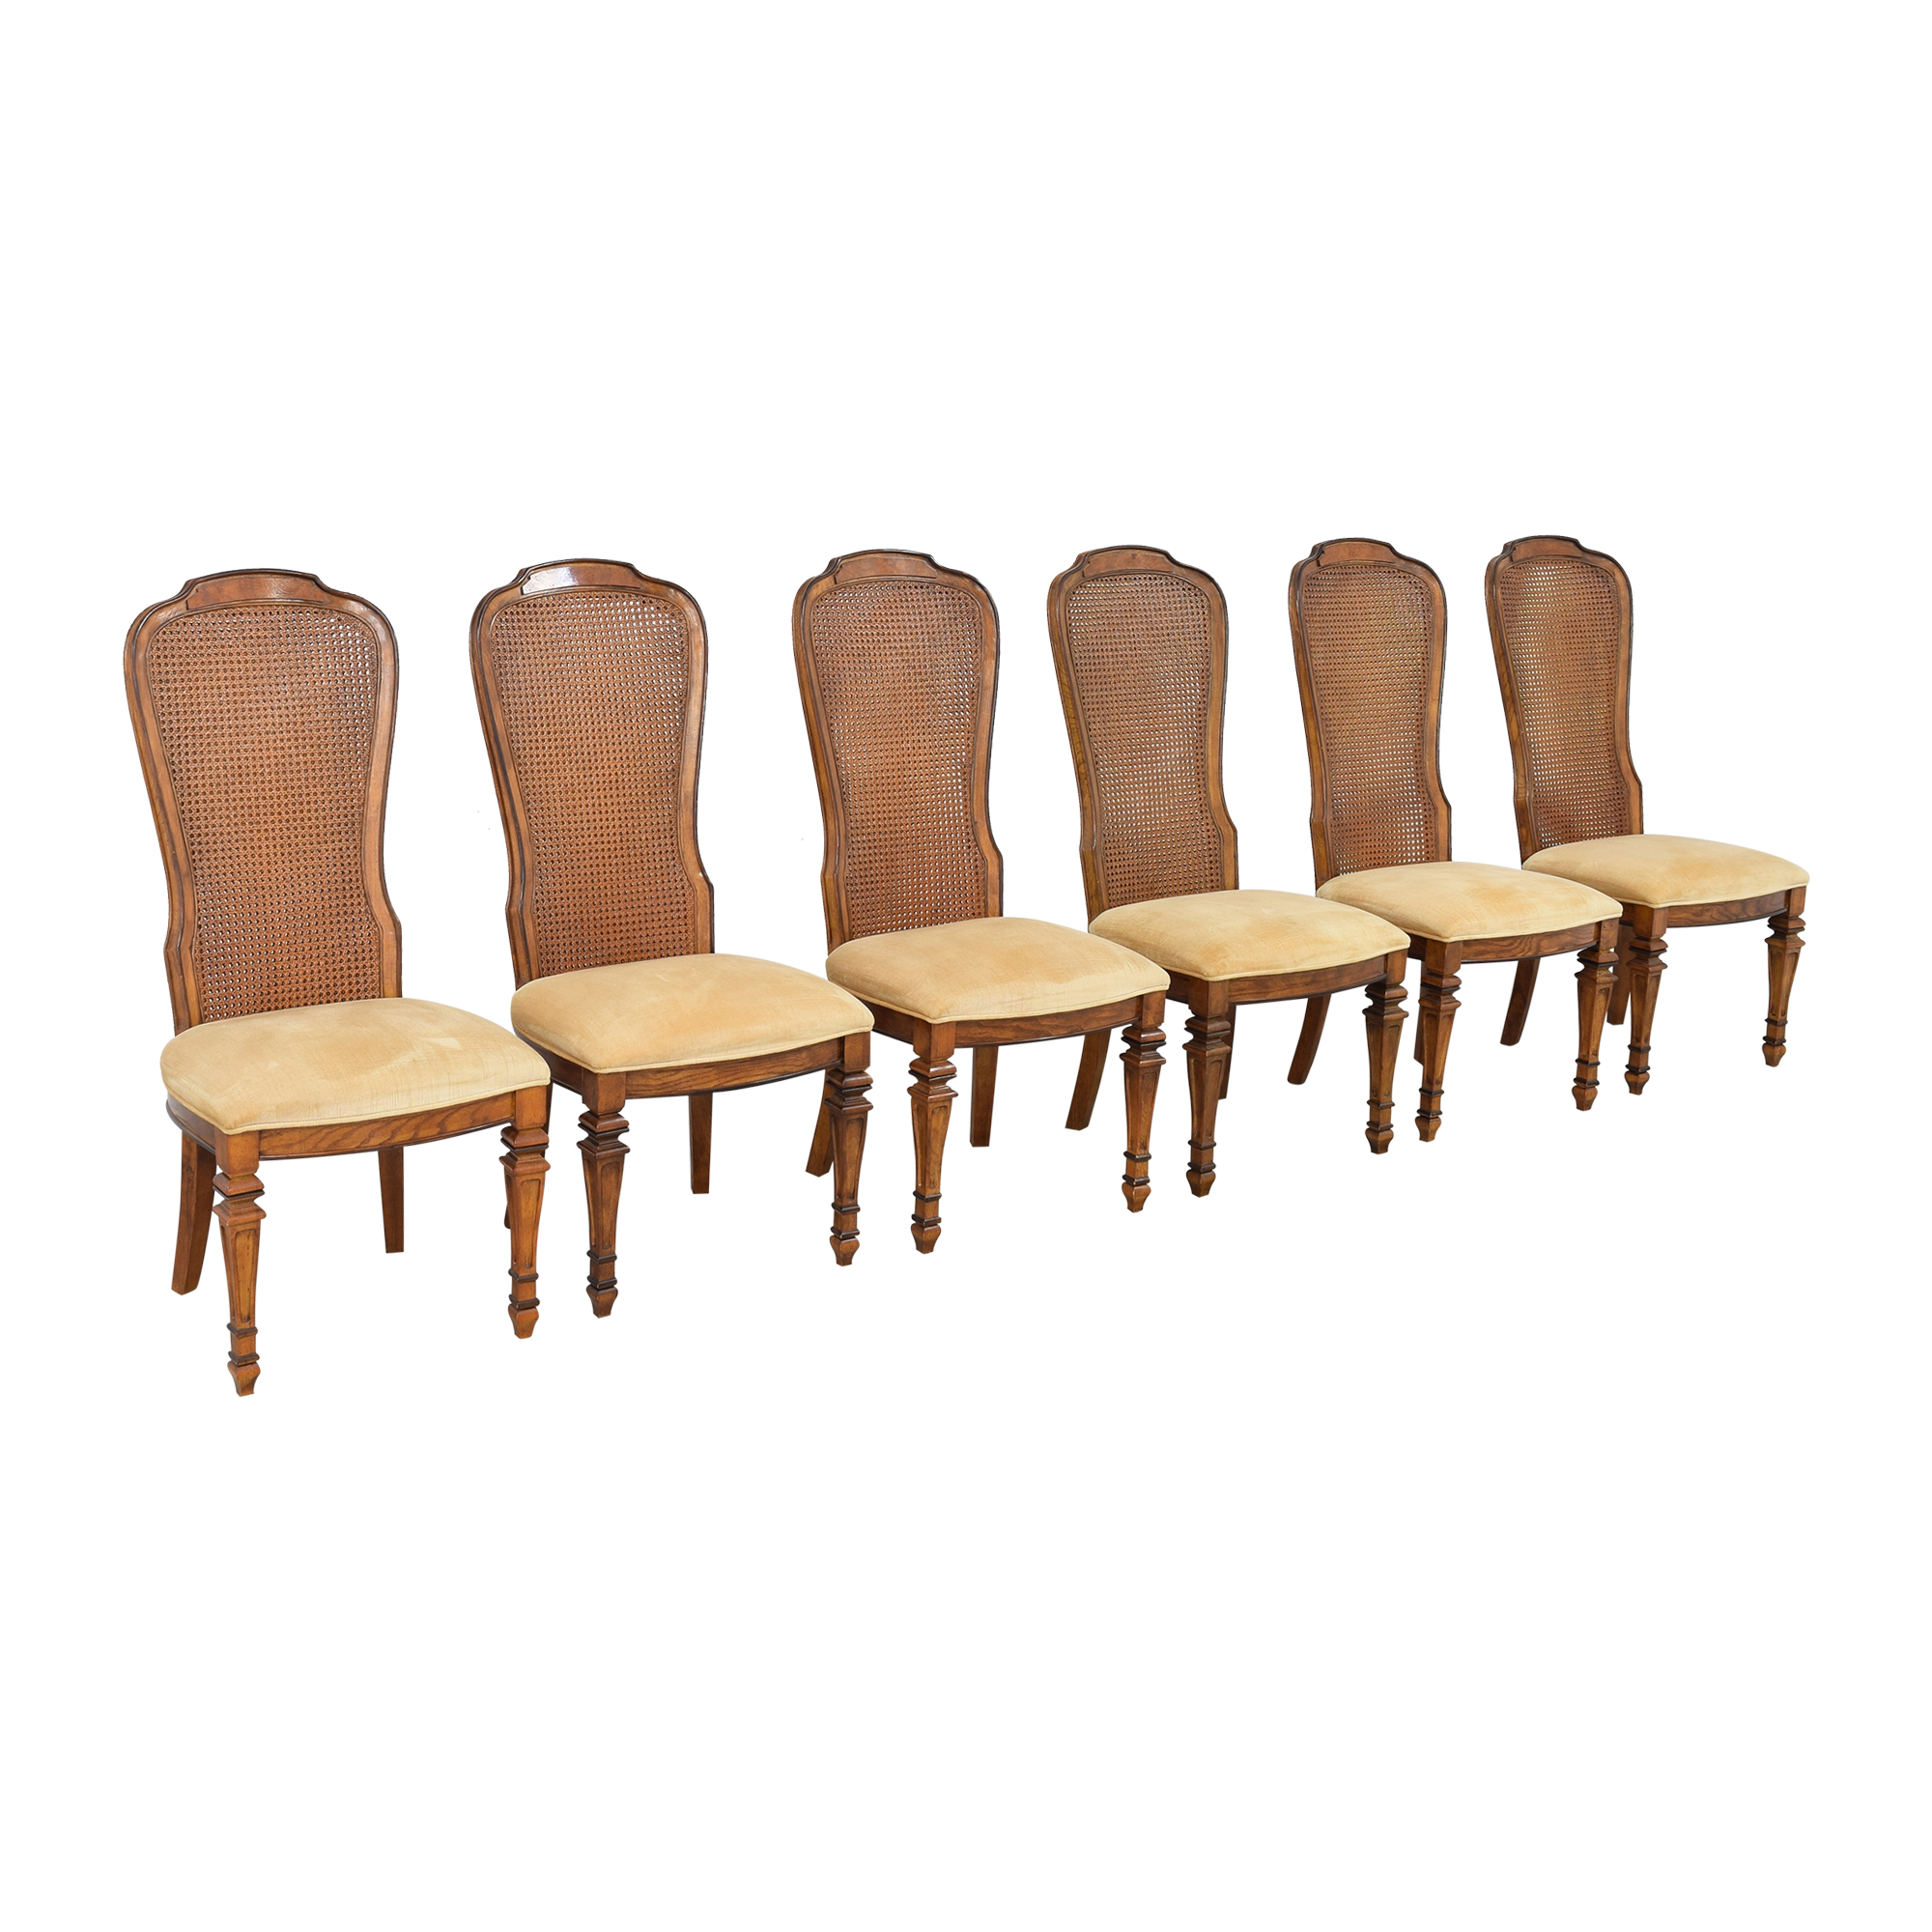 Bernhardt Bernhardt Upholstered Dining Chairs nj